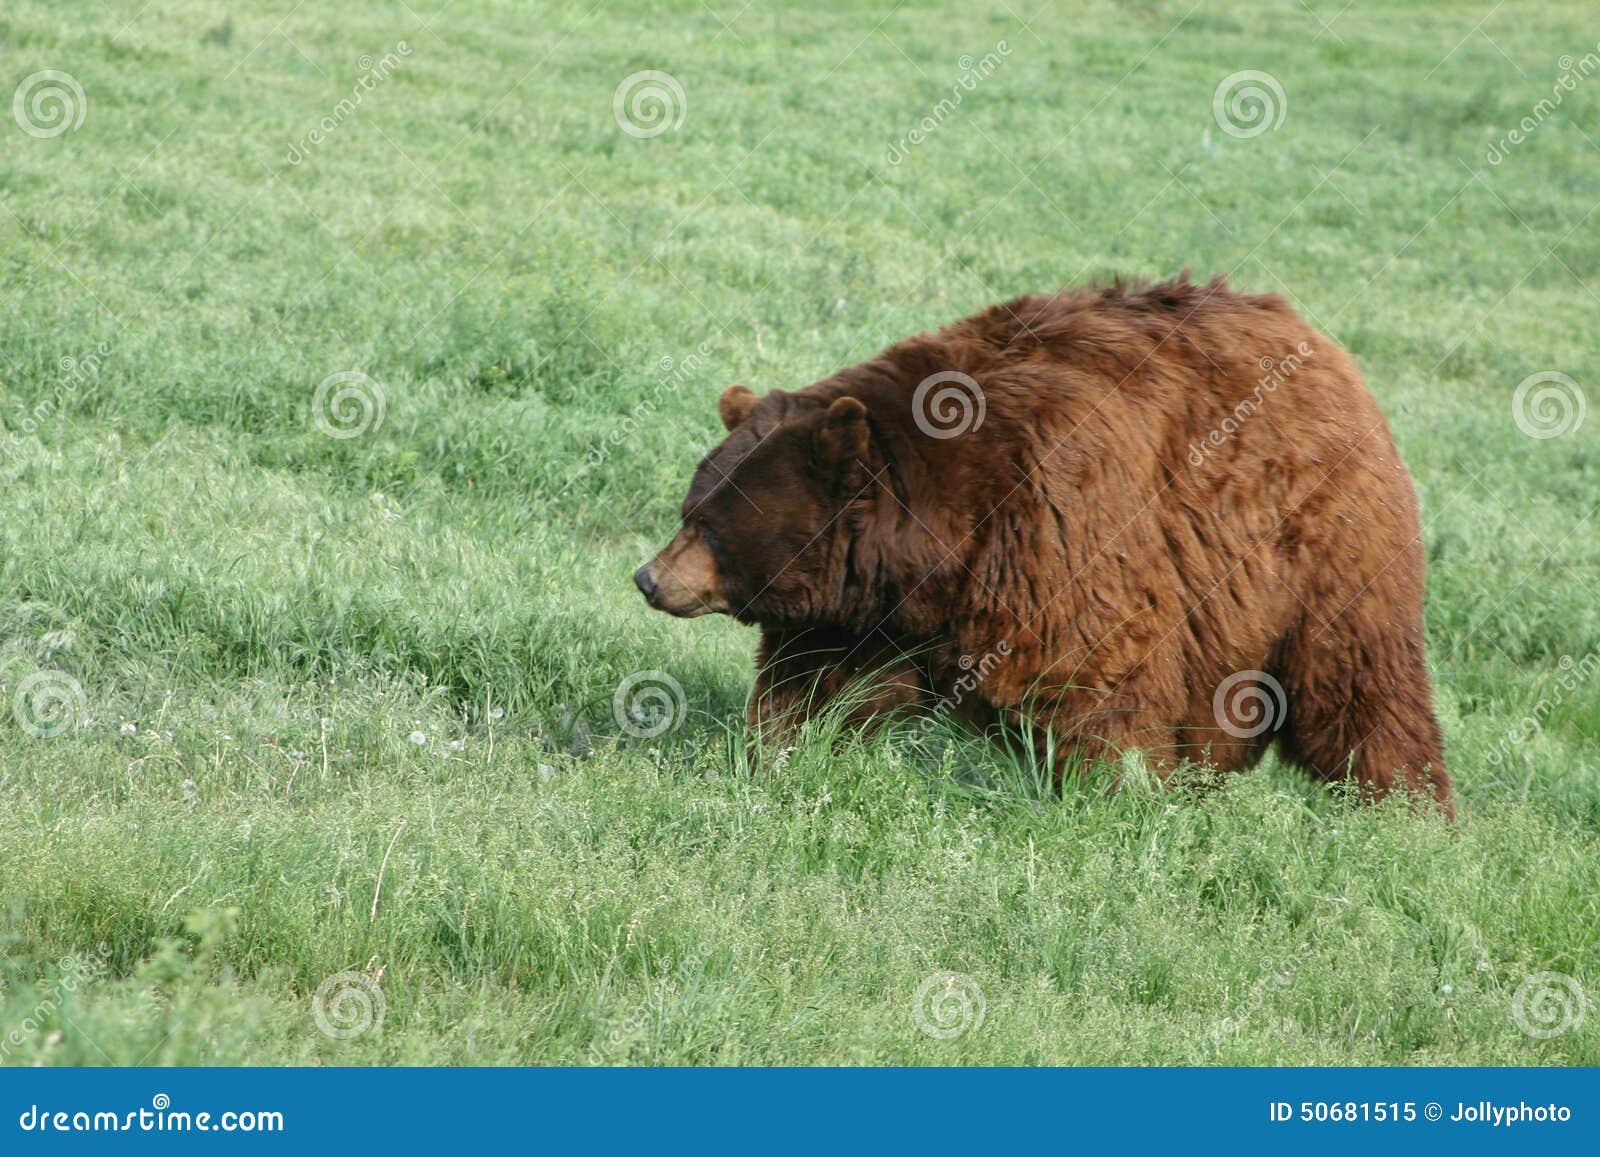 Download 世界纪录肥胖北美灰熊 库存图片. 图片 包括有 北部, 牺牲者, 搜索, browne, 危险, 怀俄明 - 50681515